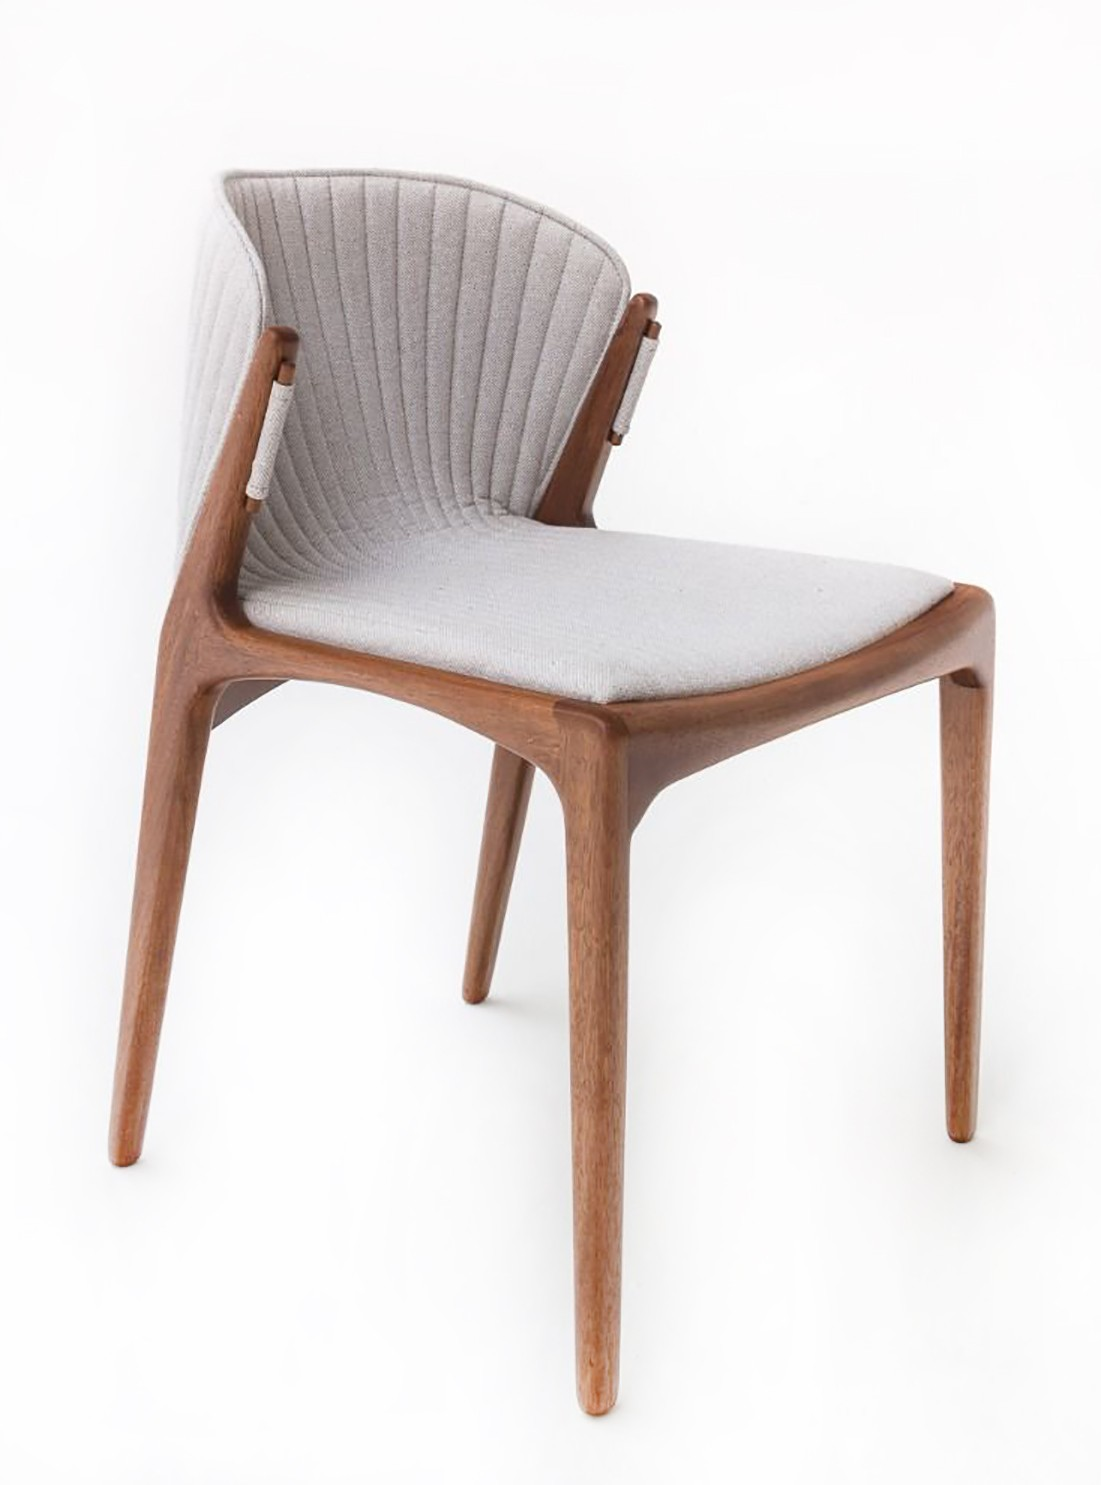 Cadeira Luisa • estudiobola